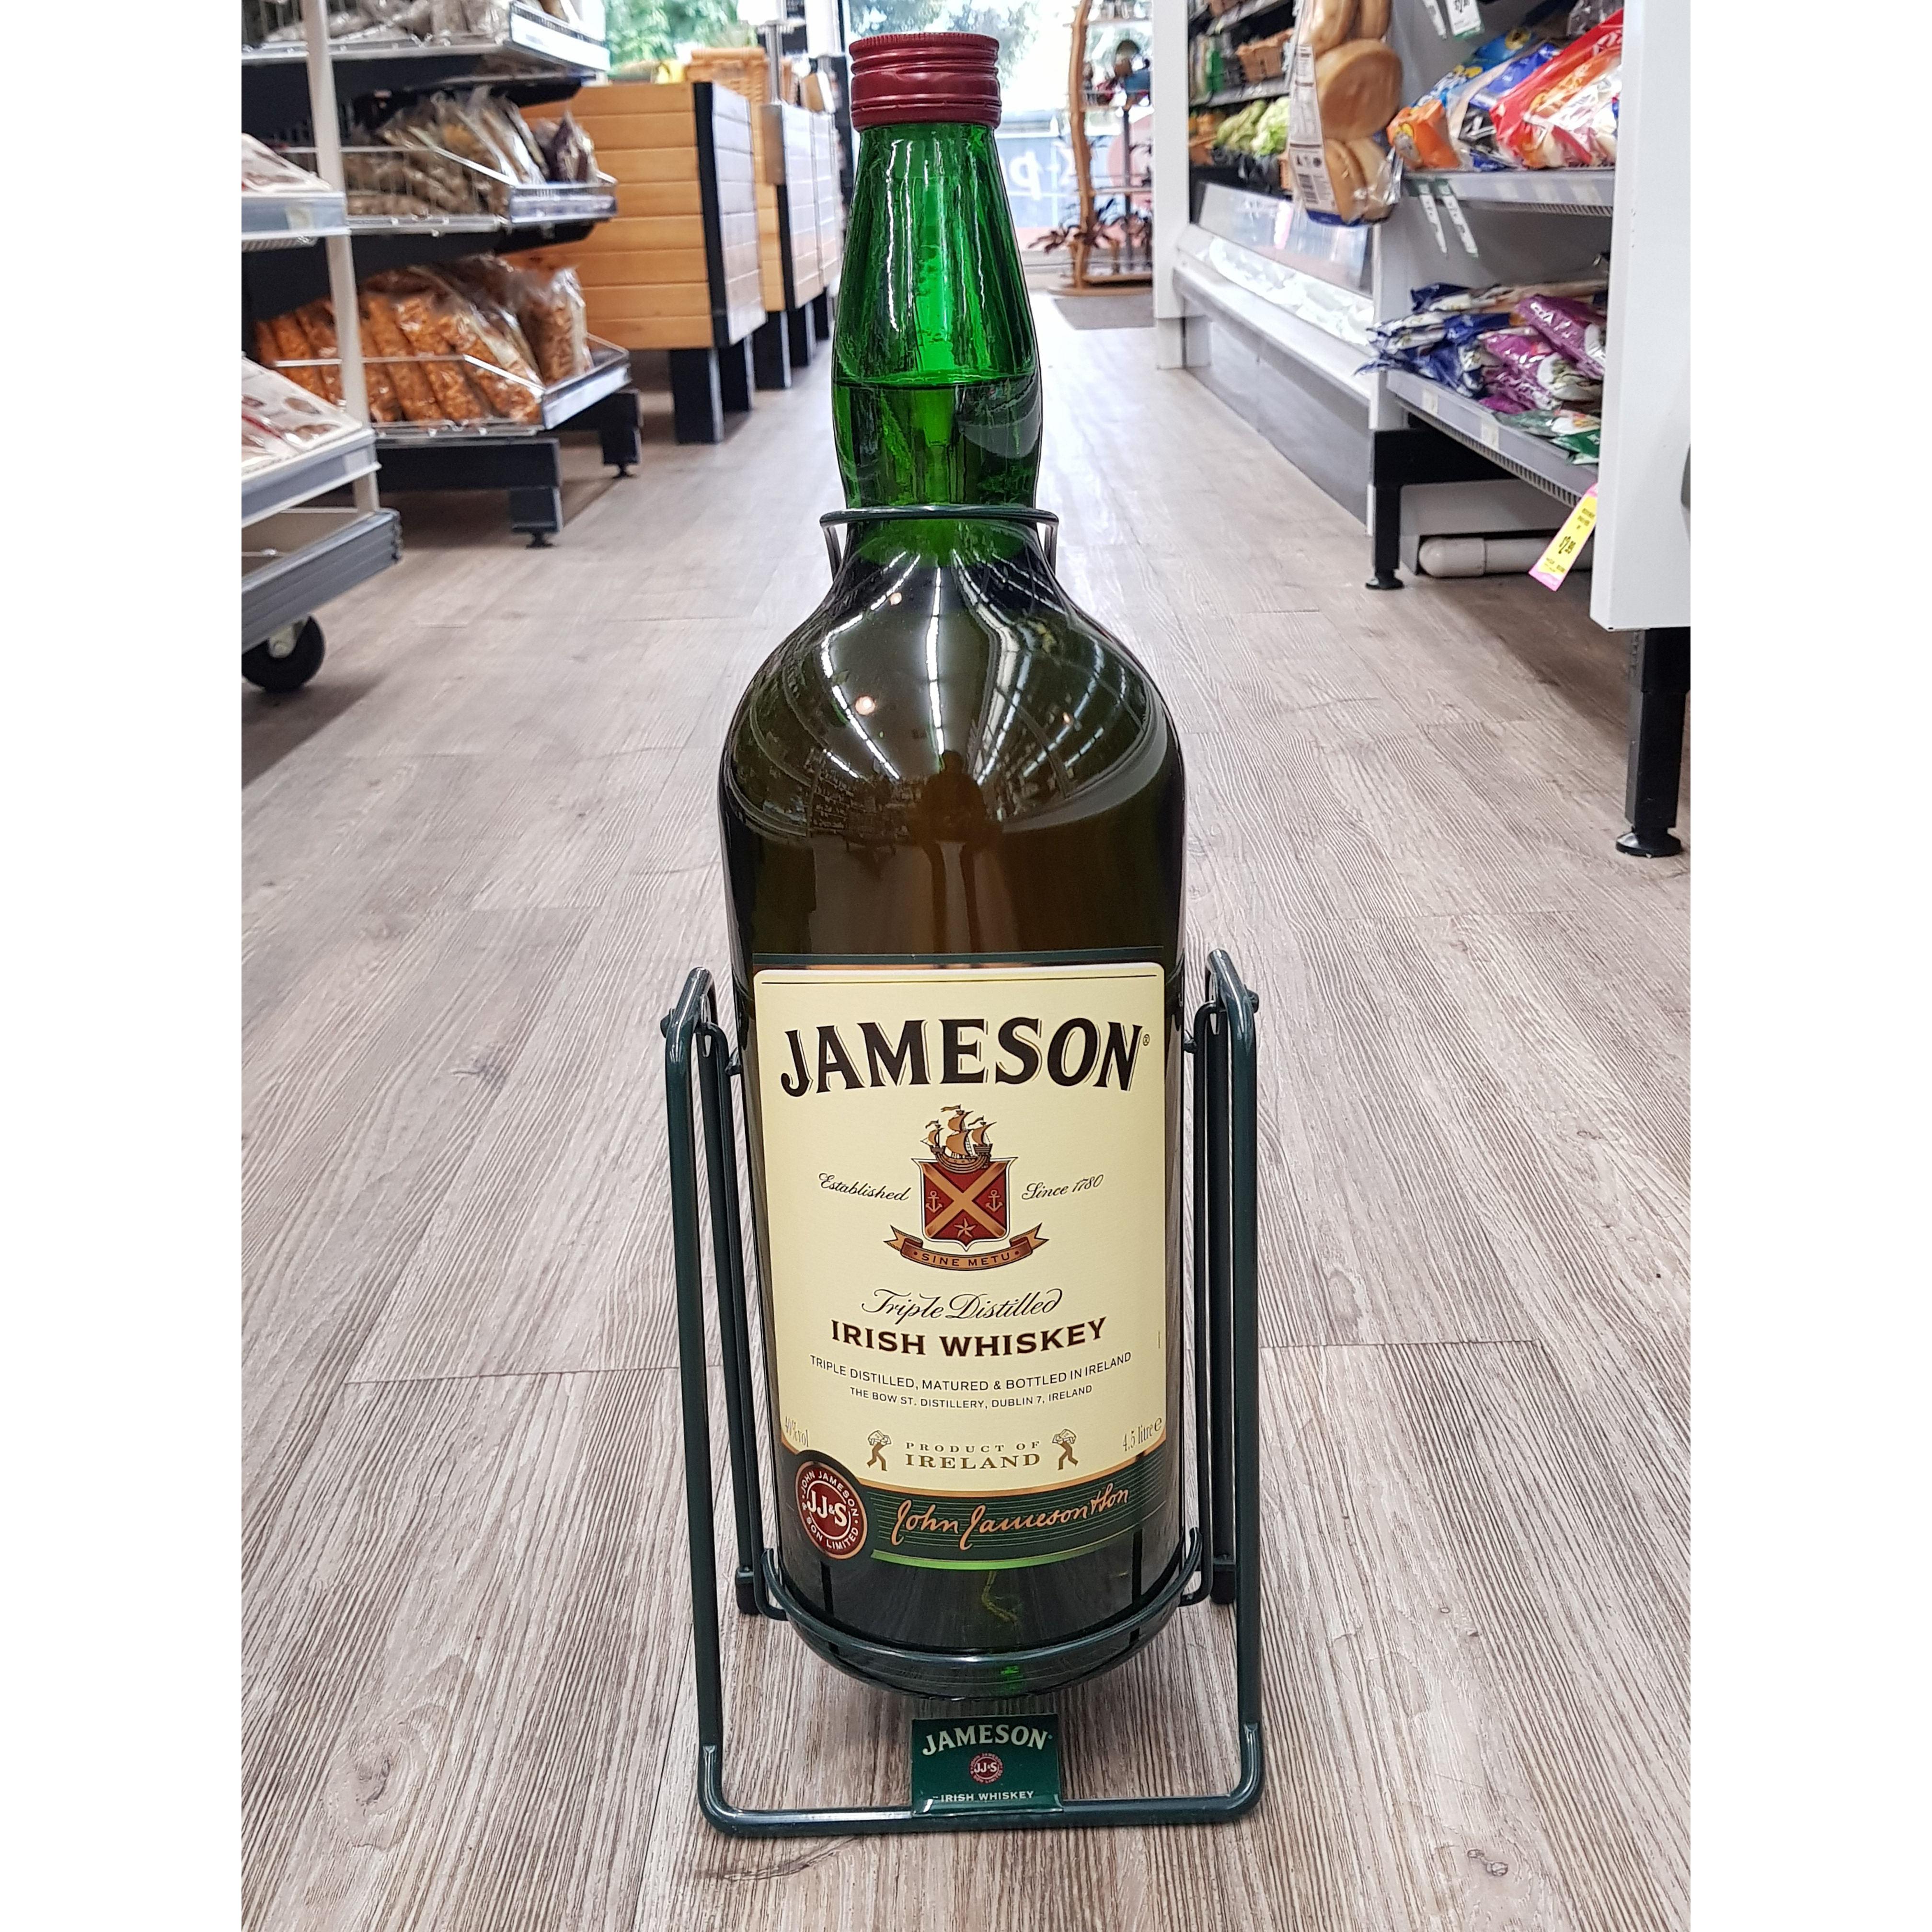 Bar Unisex Apron Pocket Whiskey Bottles Drink